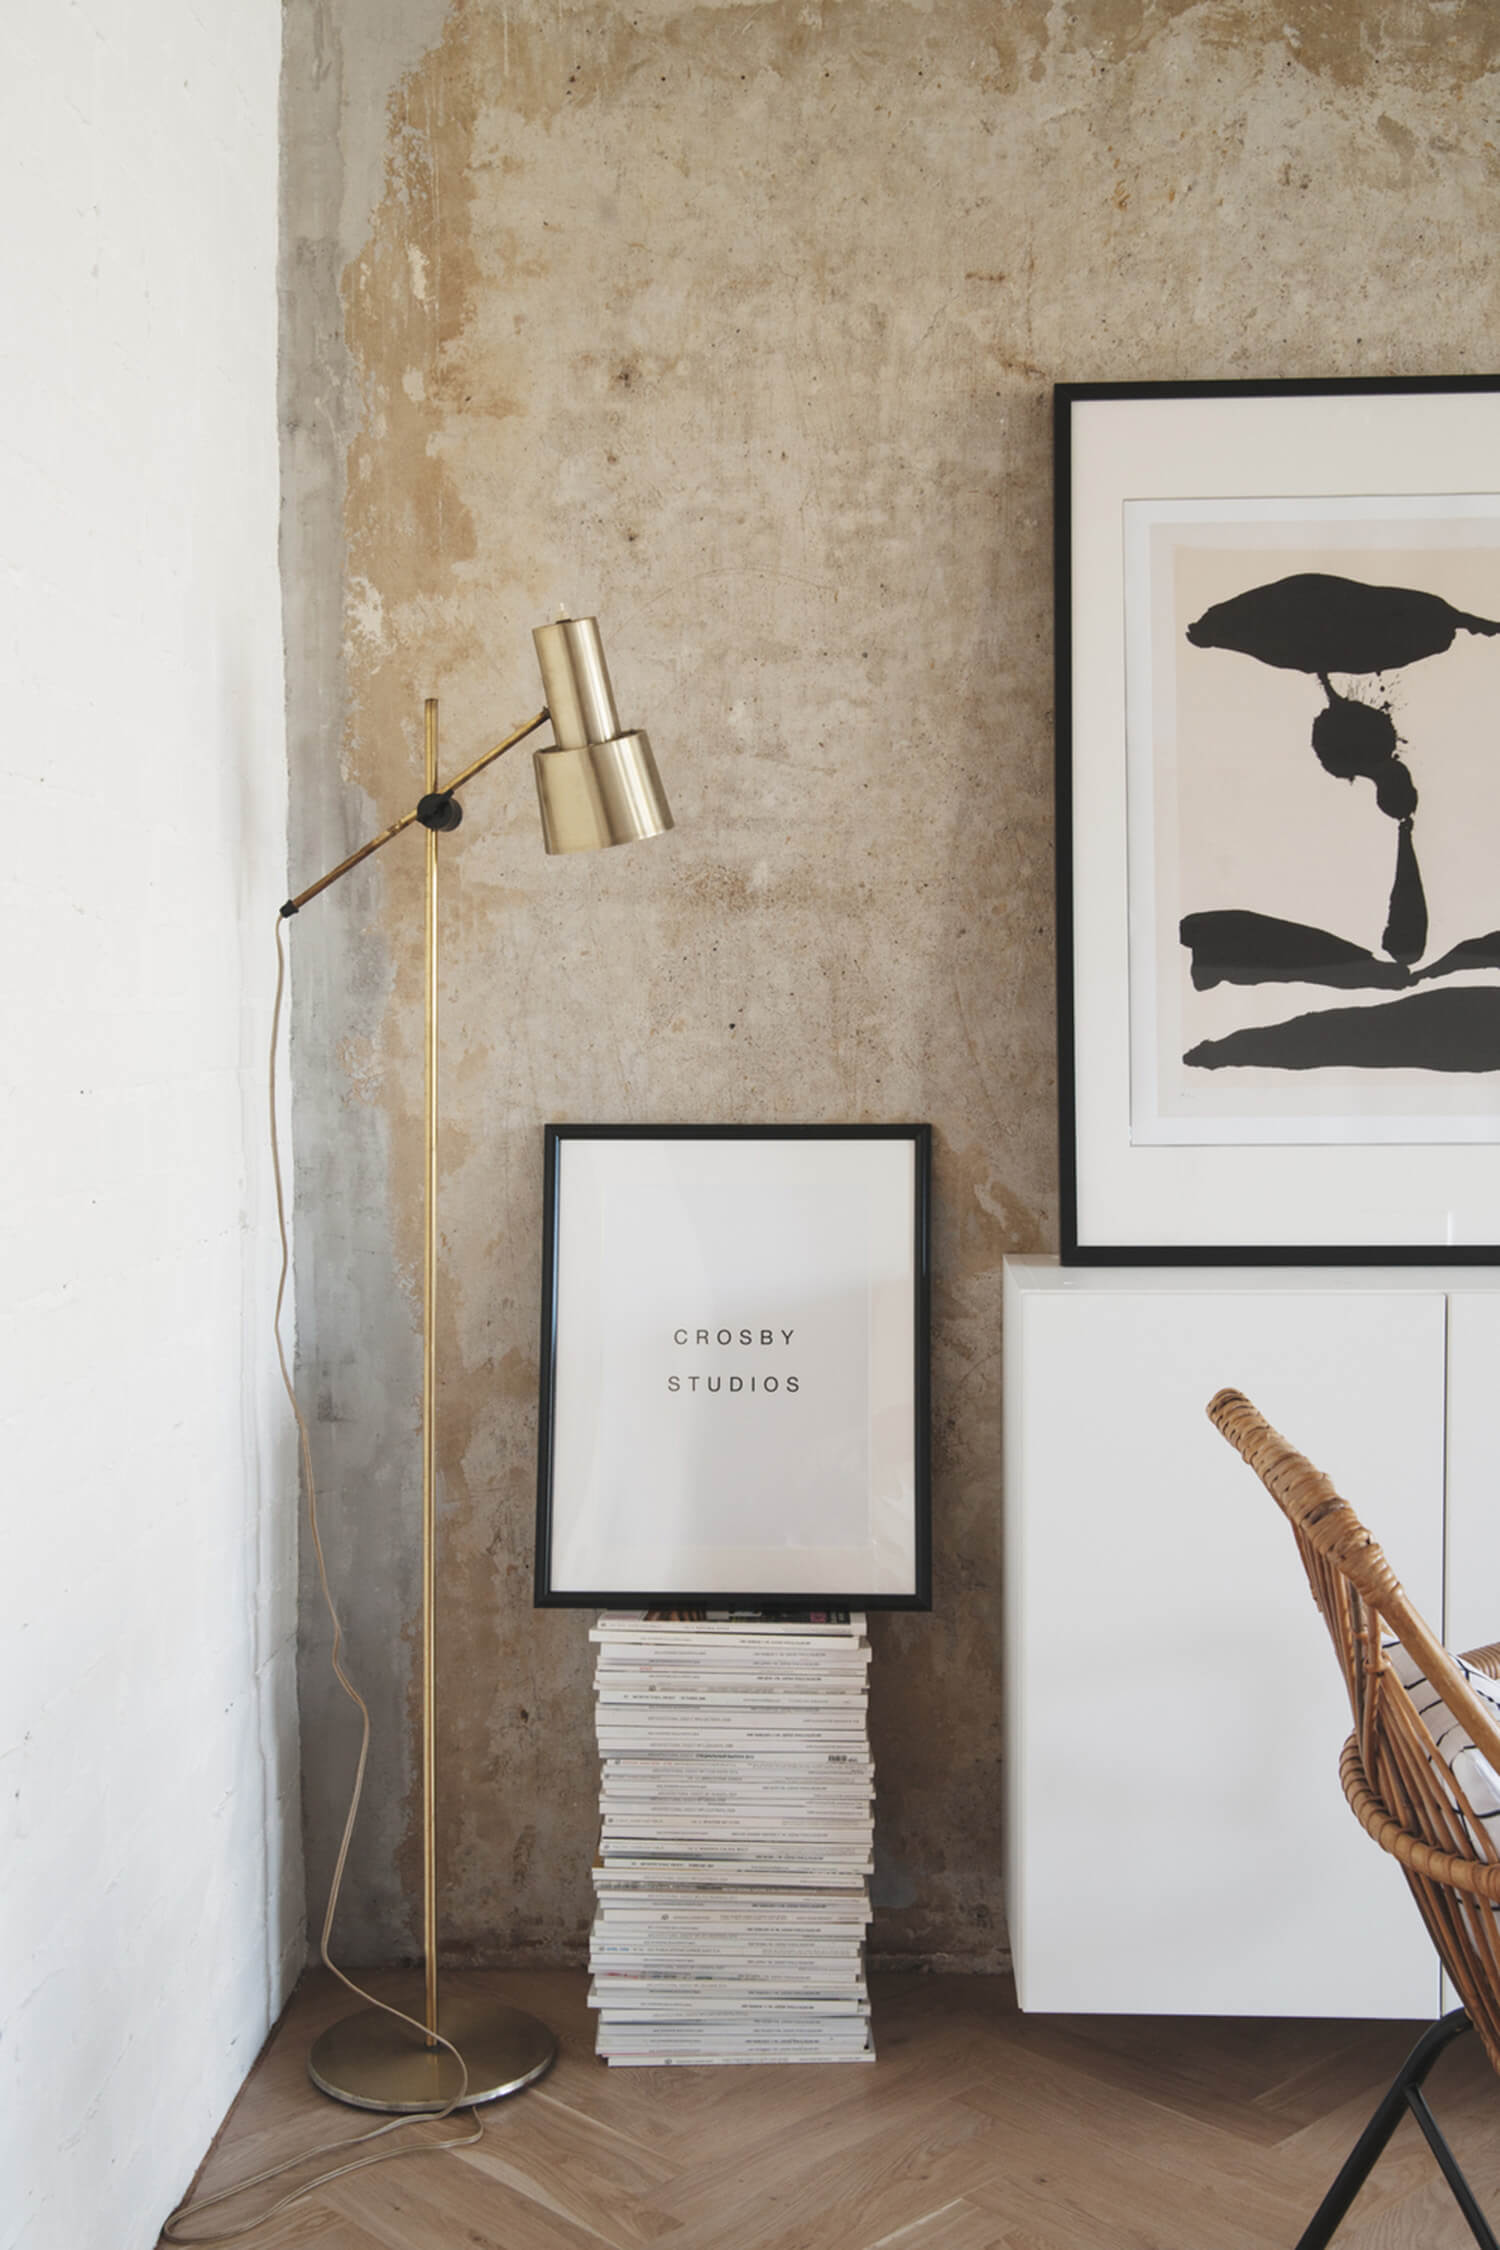 est living concrete ceiling apartment crosby studios